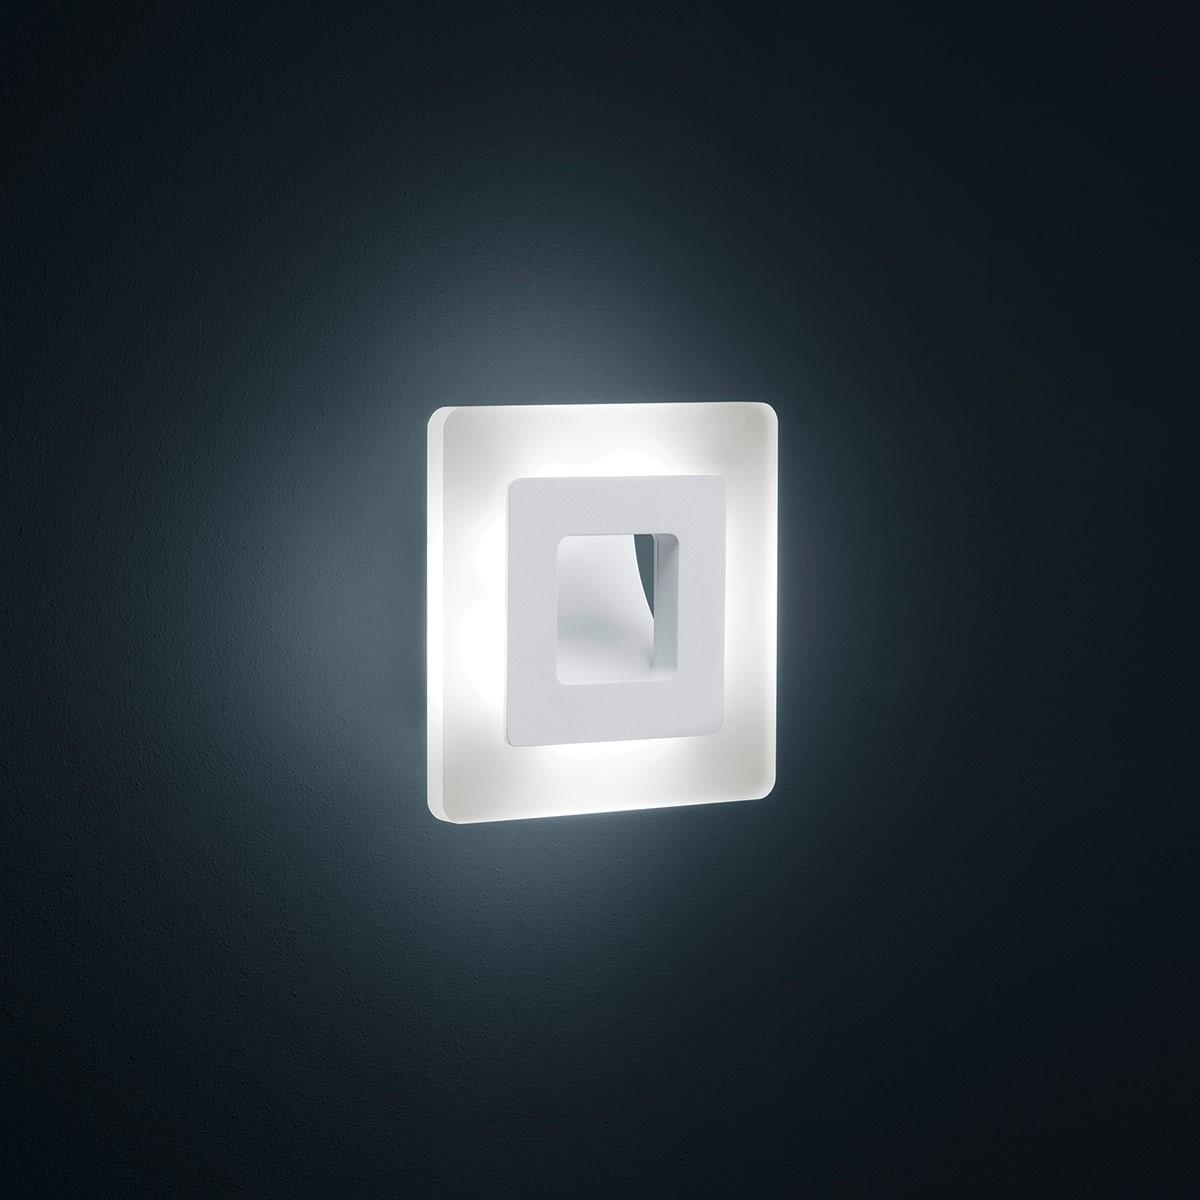 Helestra Jenna Wand-/Deckenleuchte, weiß matt, quadratisch